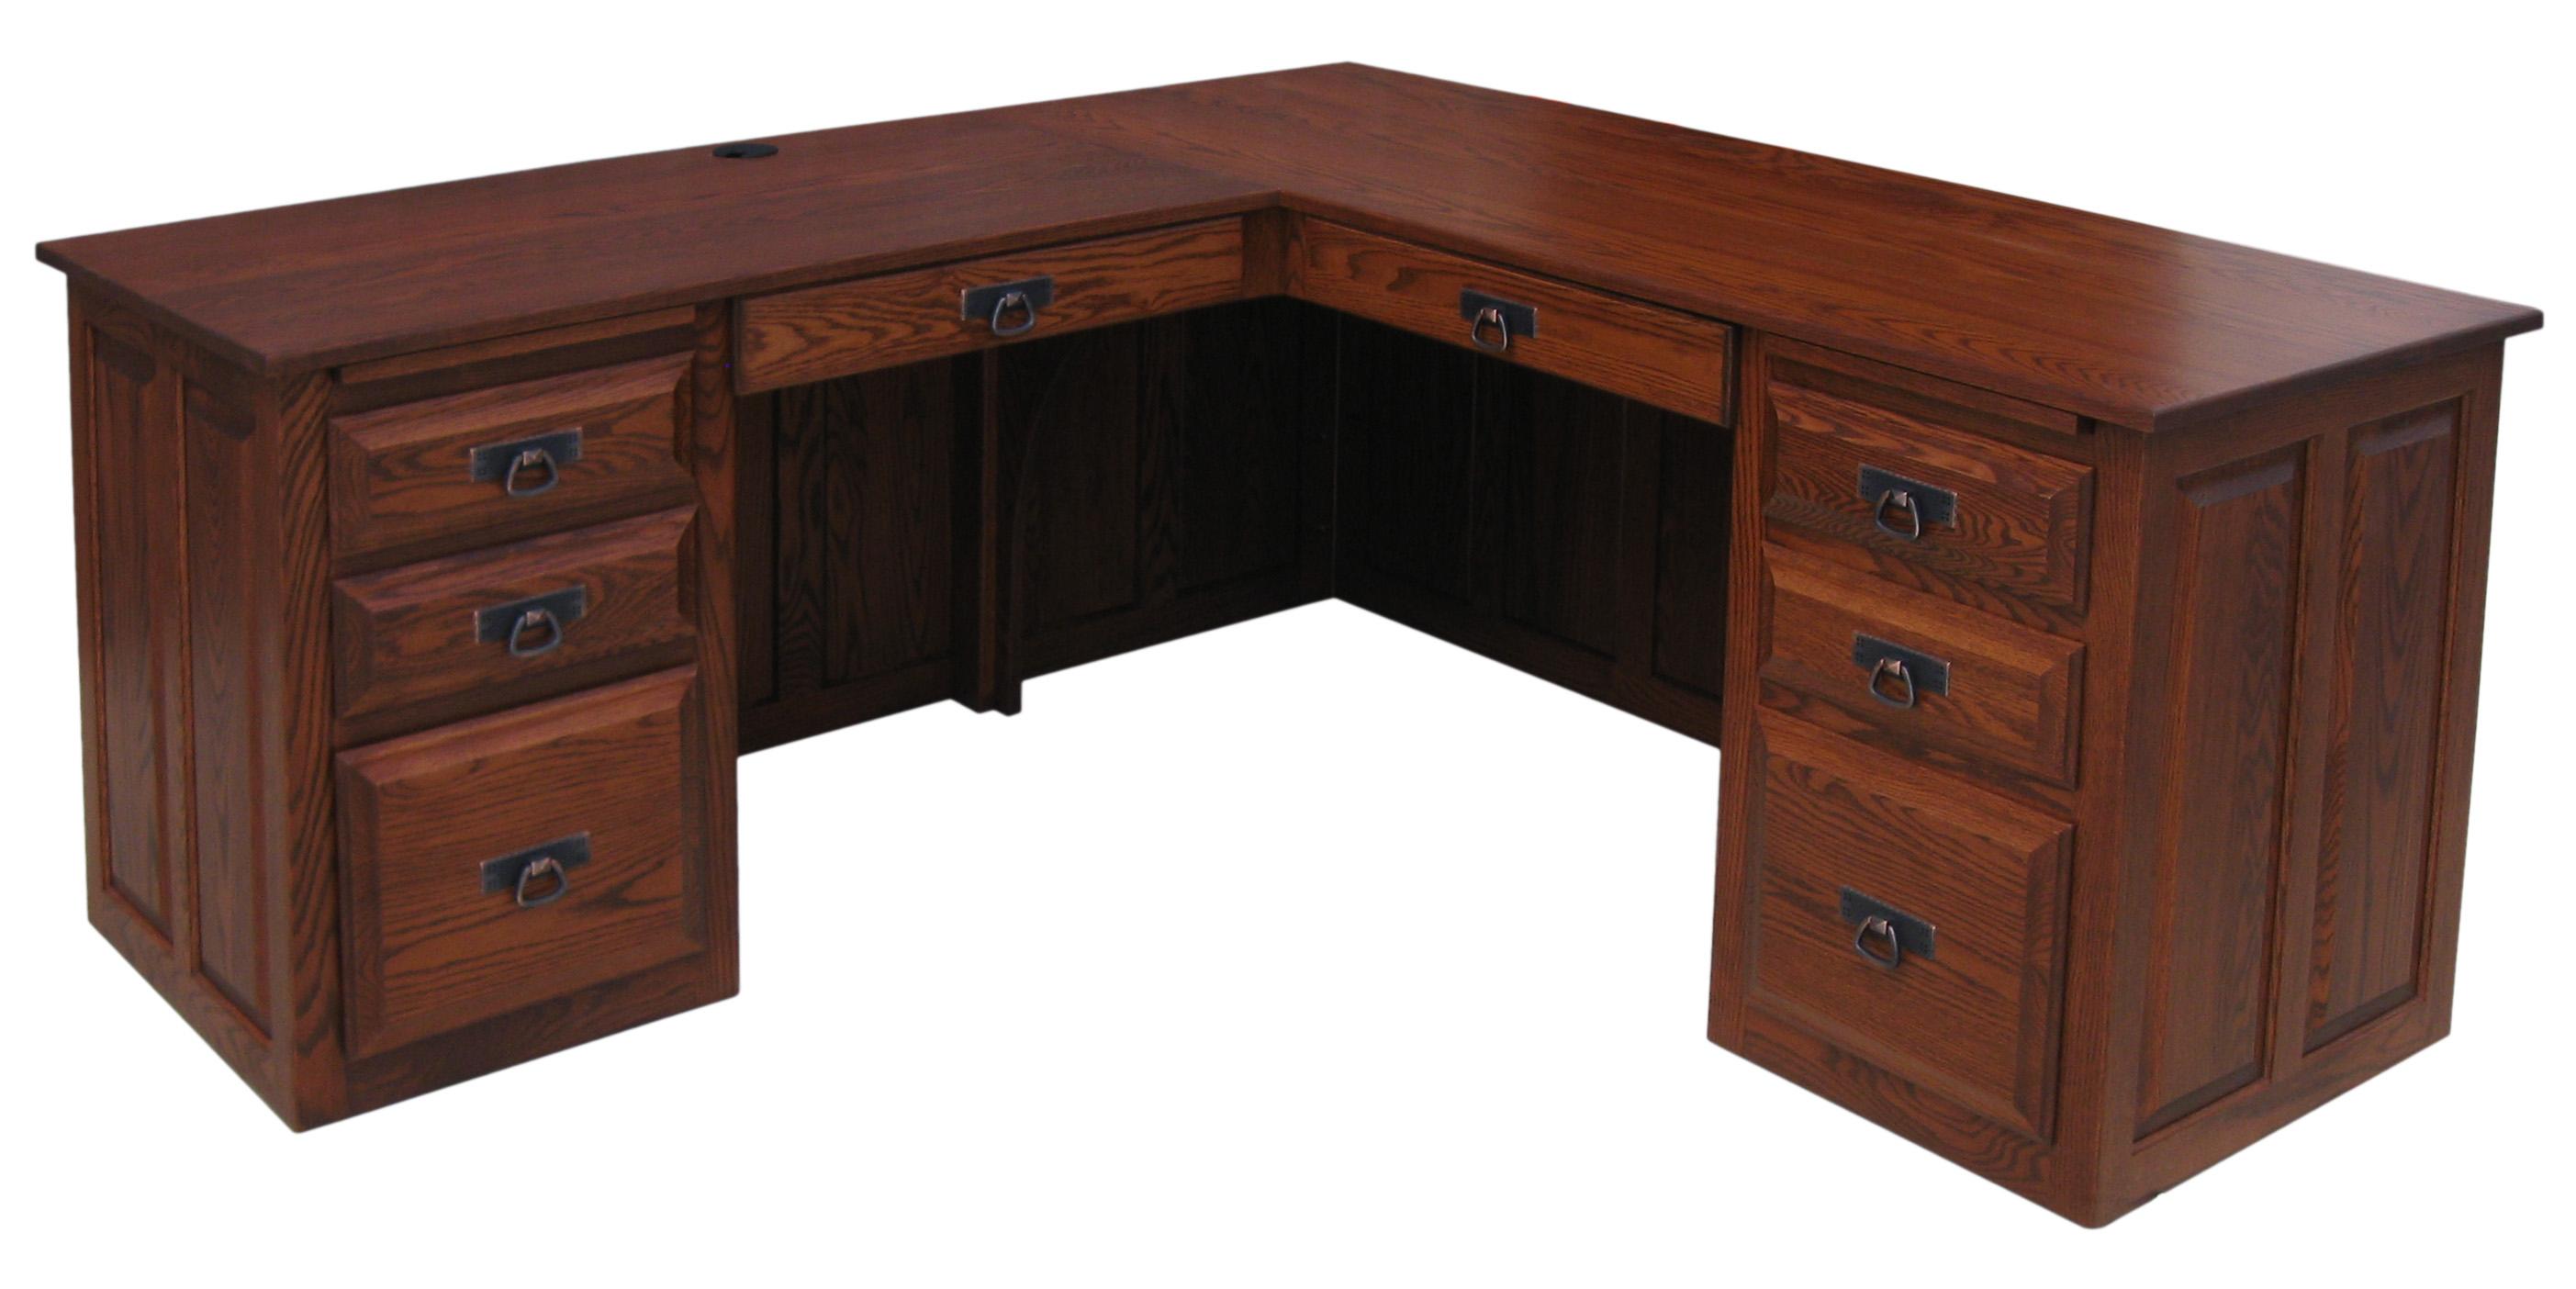 Traditional Executive Corner Desk  Amish Furniture Connections  Amish Furniture Connections